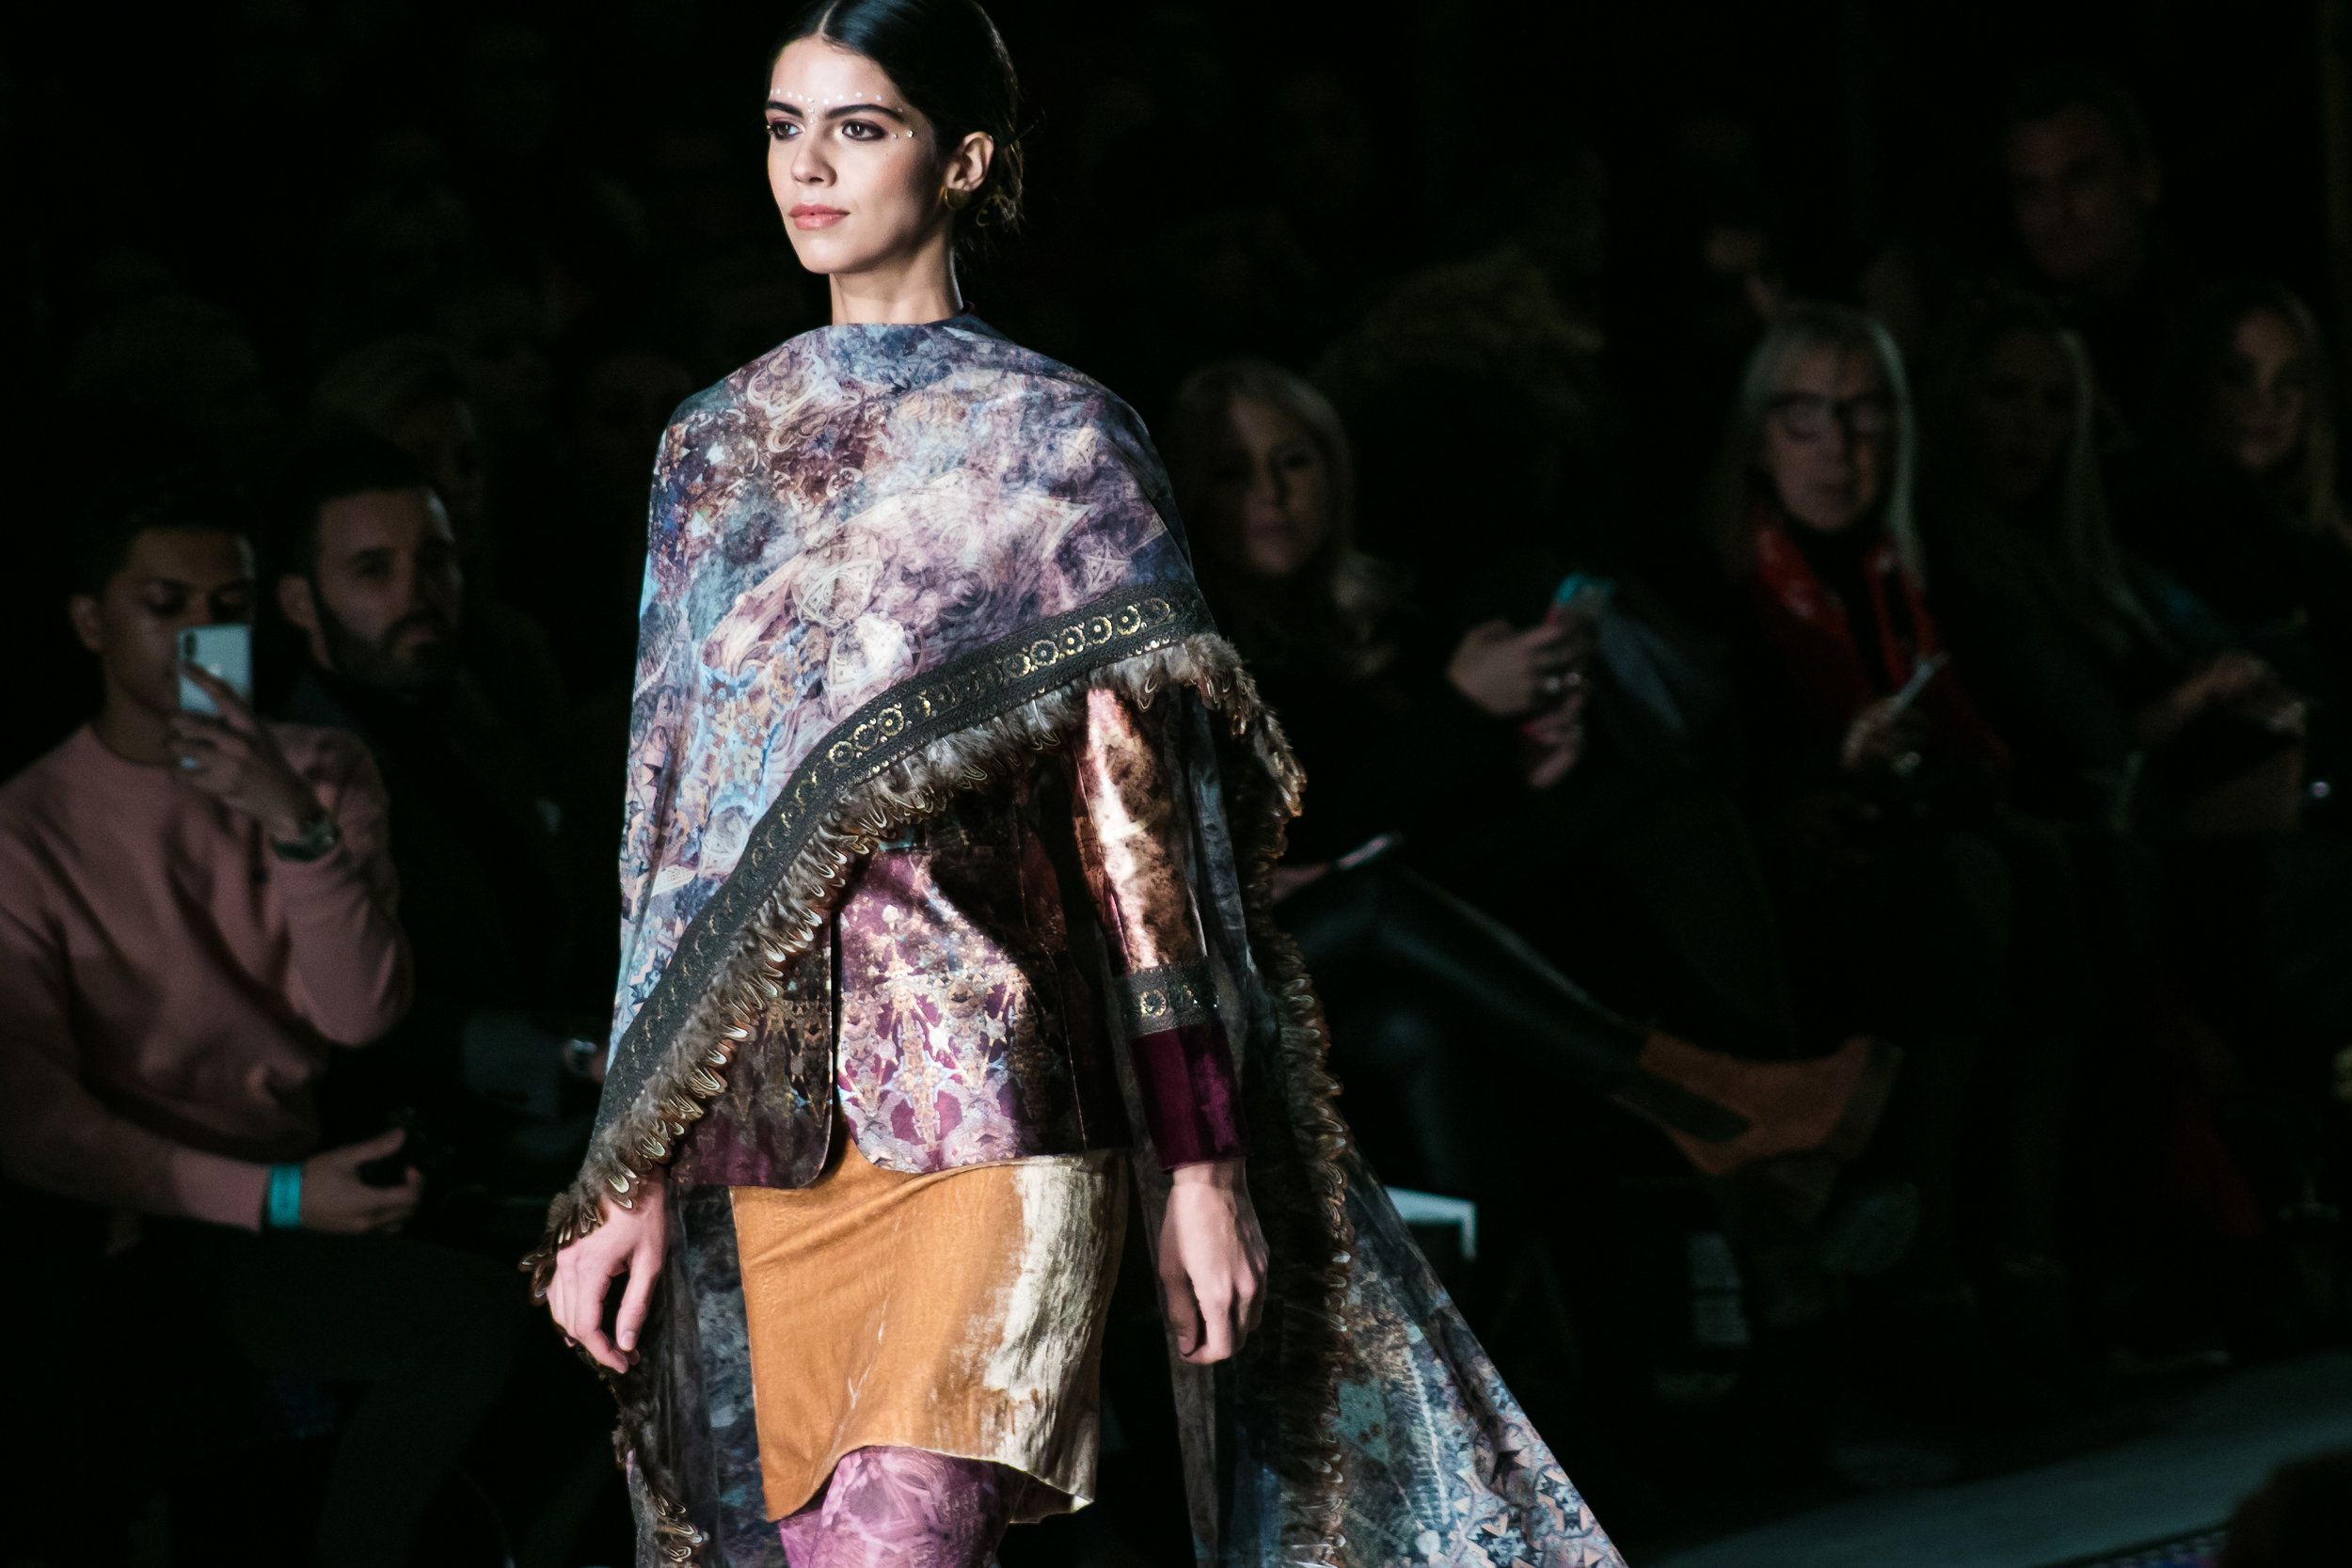 London fashion week Rocky Star AW18 5.jpg